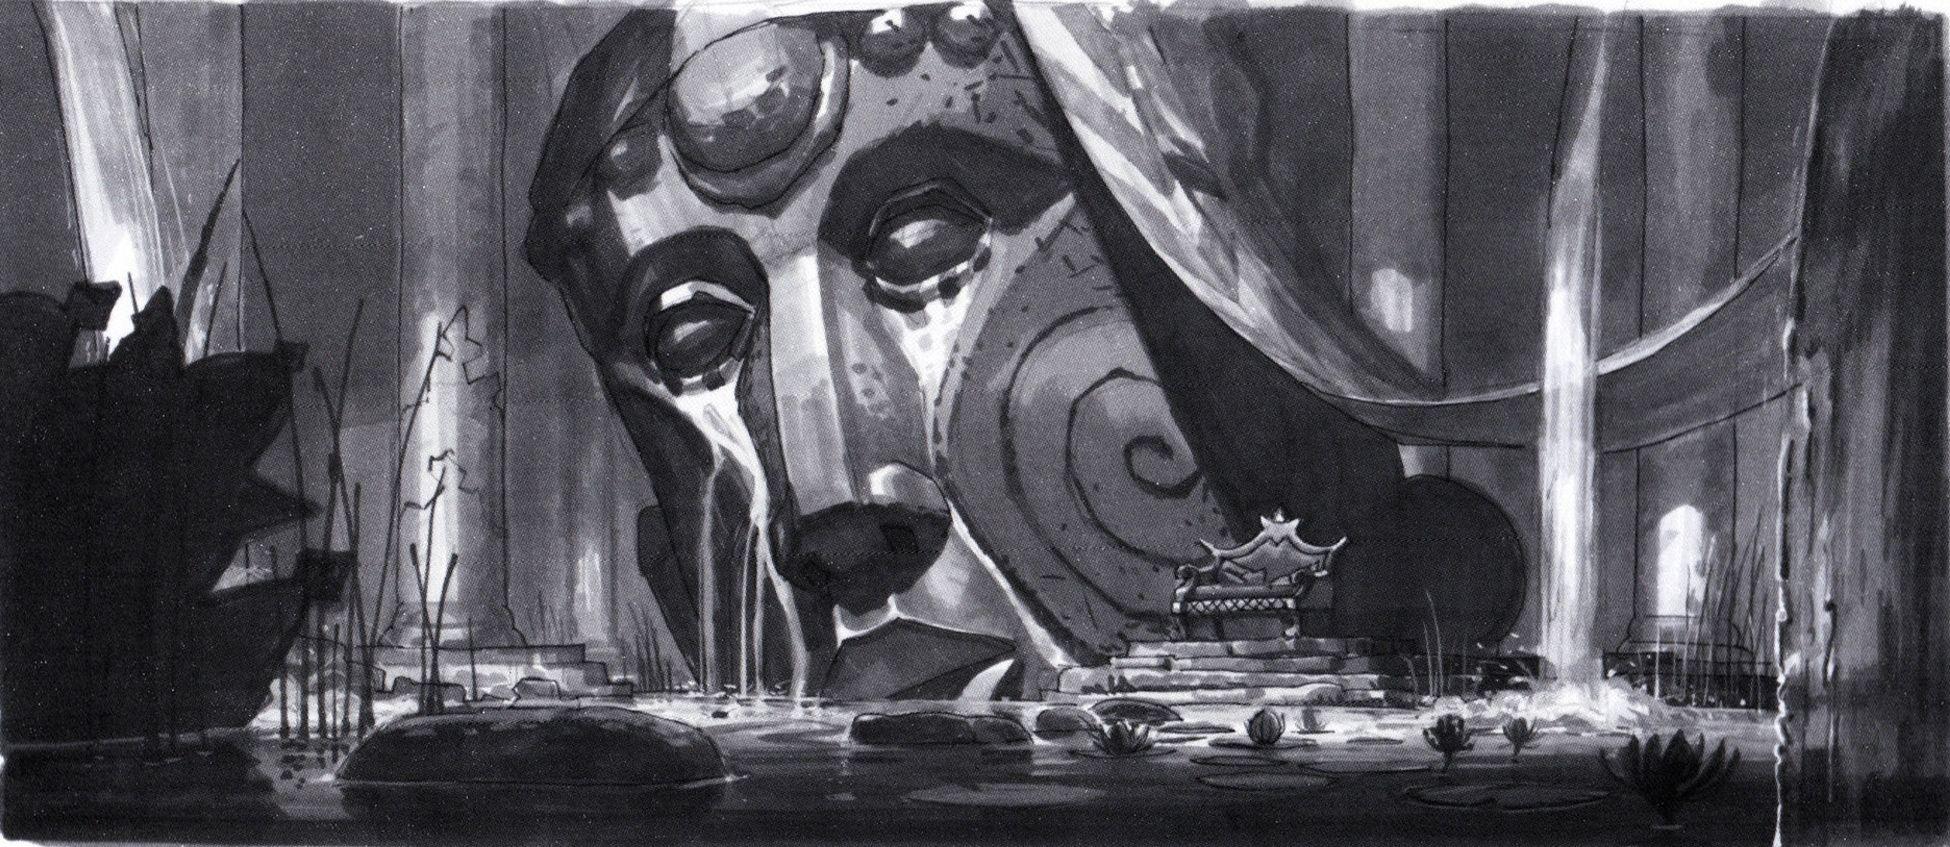 Atlantide, l'Empire Perdu [Walt Disney - 2001] - Page 7 C5b36fc25c87b06b93b28f0364c21294